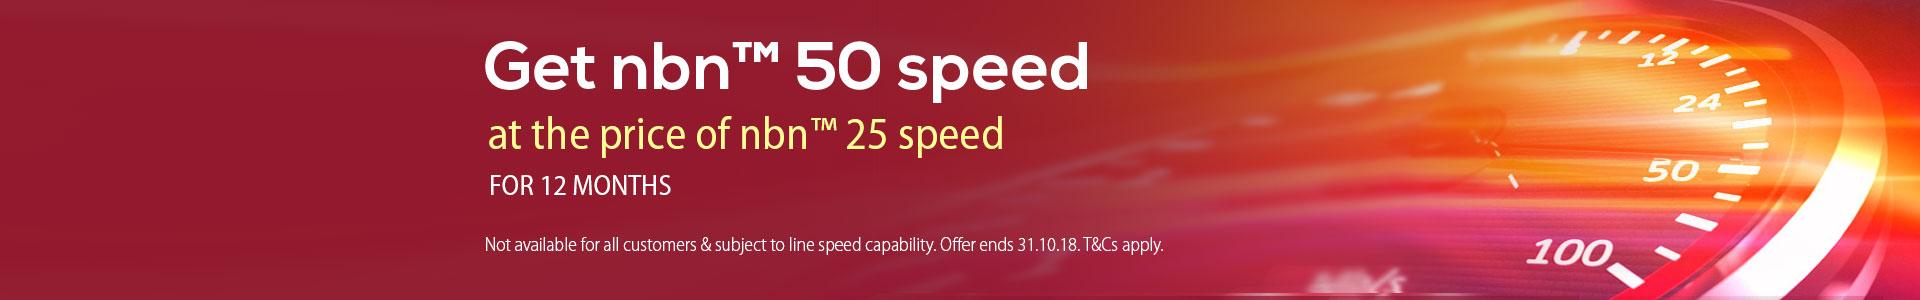 bnr_nbn-turbo-speed-1920x300